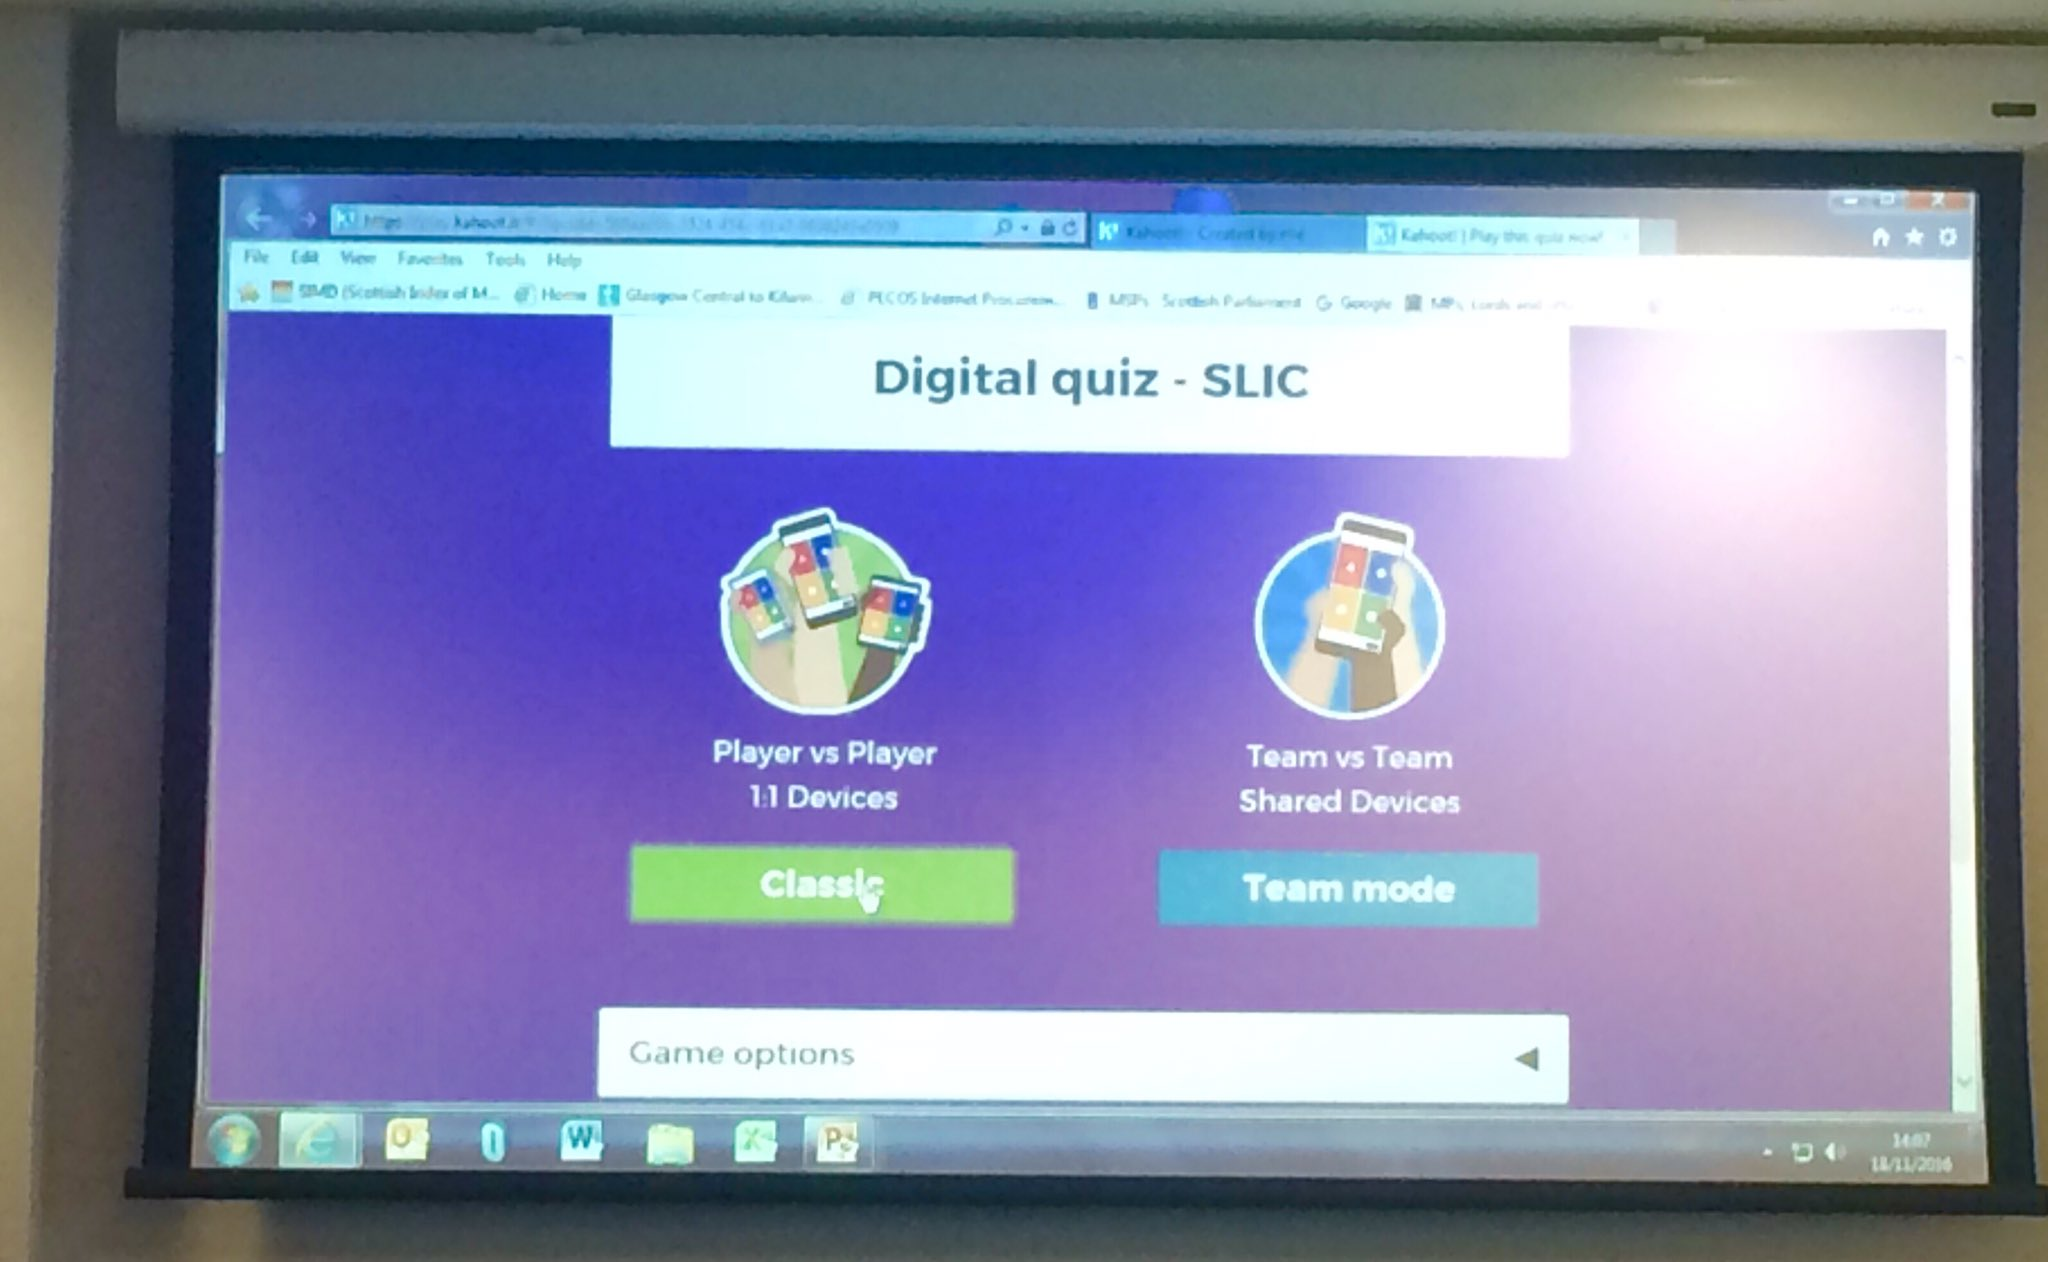 Fun digital quiz from @Betty_Murphy highlighting some v interesting stats @digiscot #scotinfolit https://t.co/ifRUumU3kD